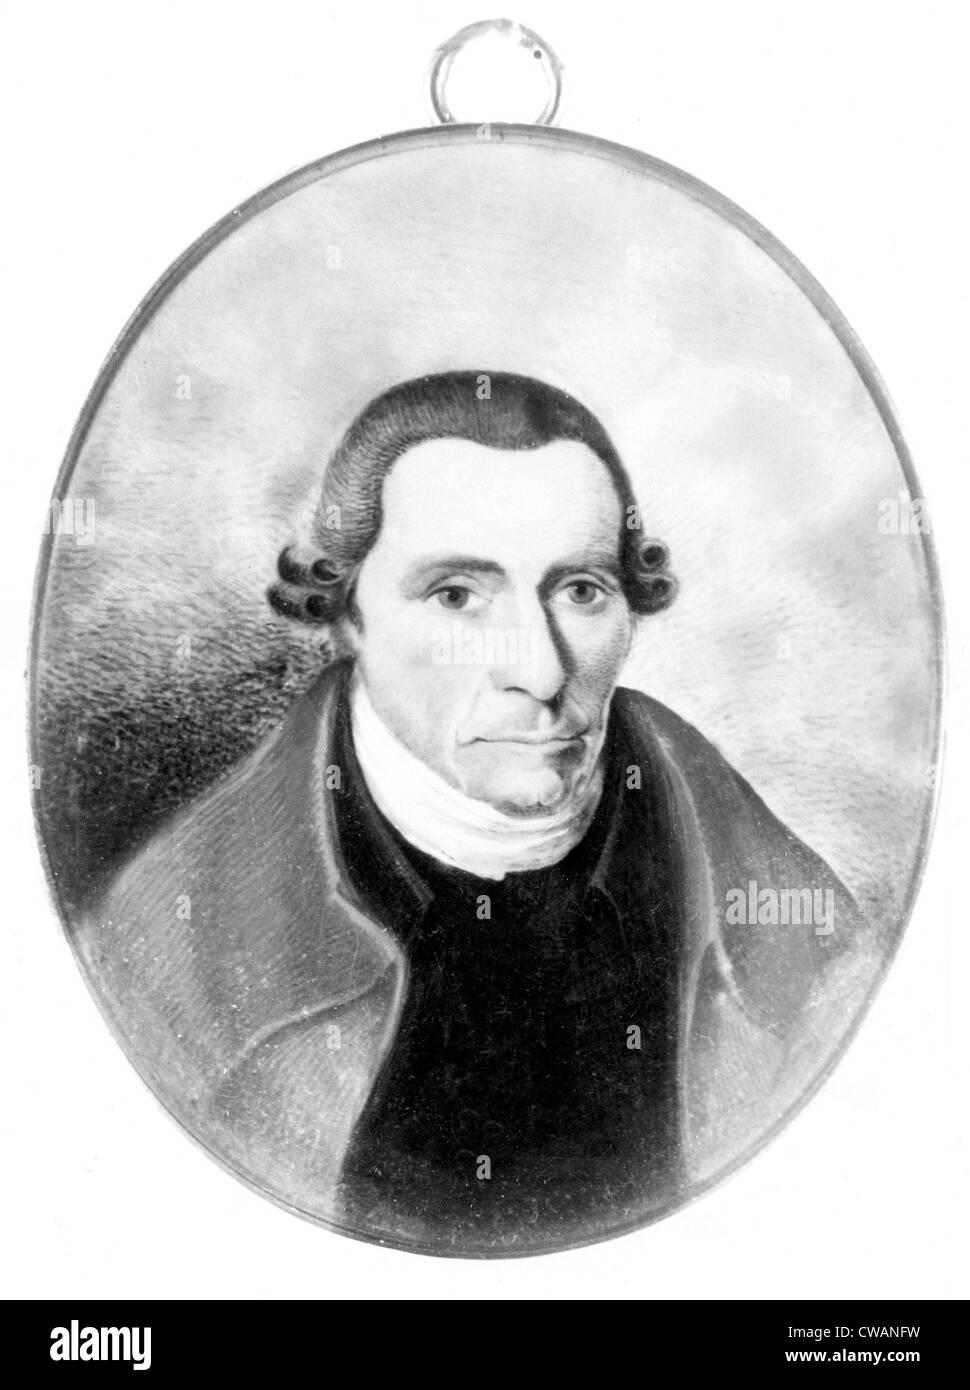 Patrick Henry, Portrait... Höflichkeit: CSU Archive / Everett Collection Stockbild